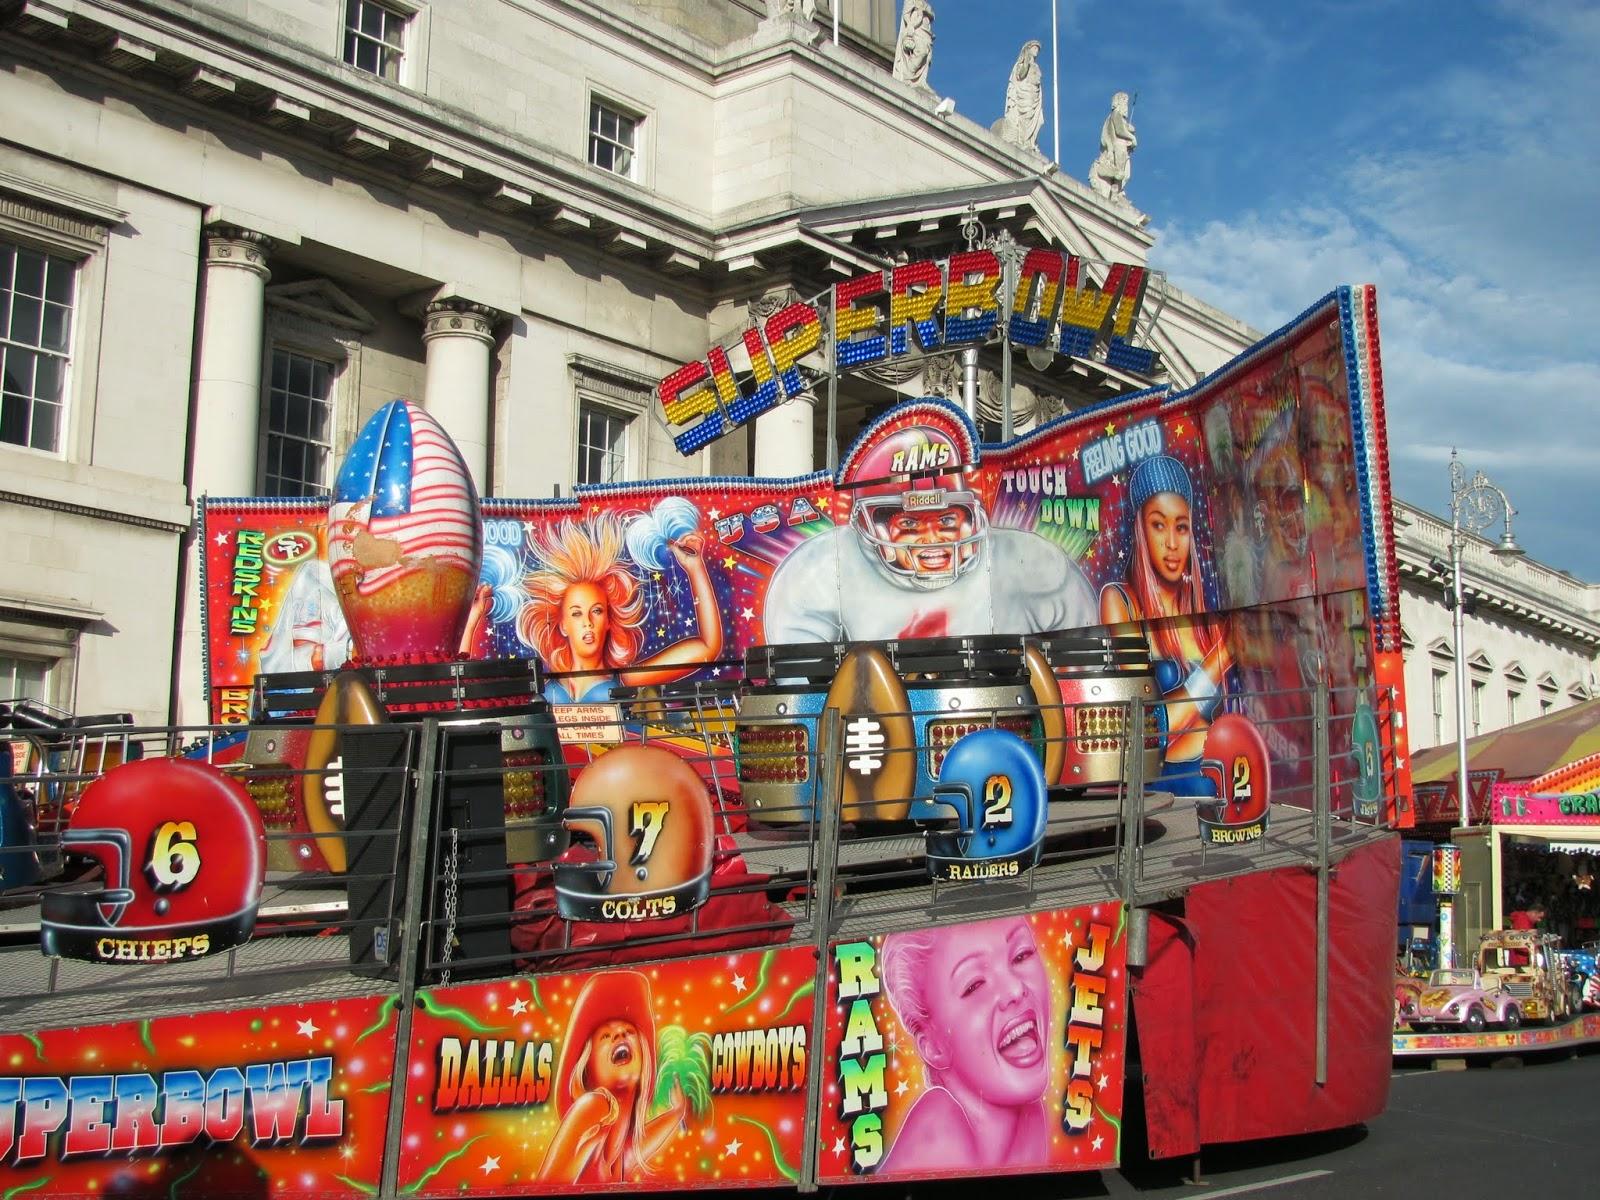 Football-themed ride in Dublin